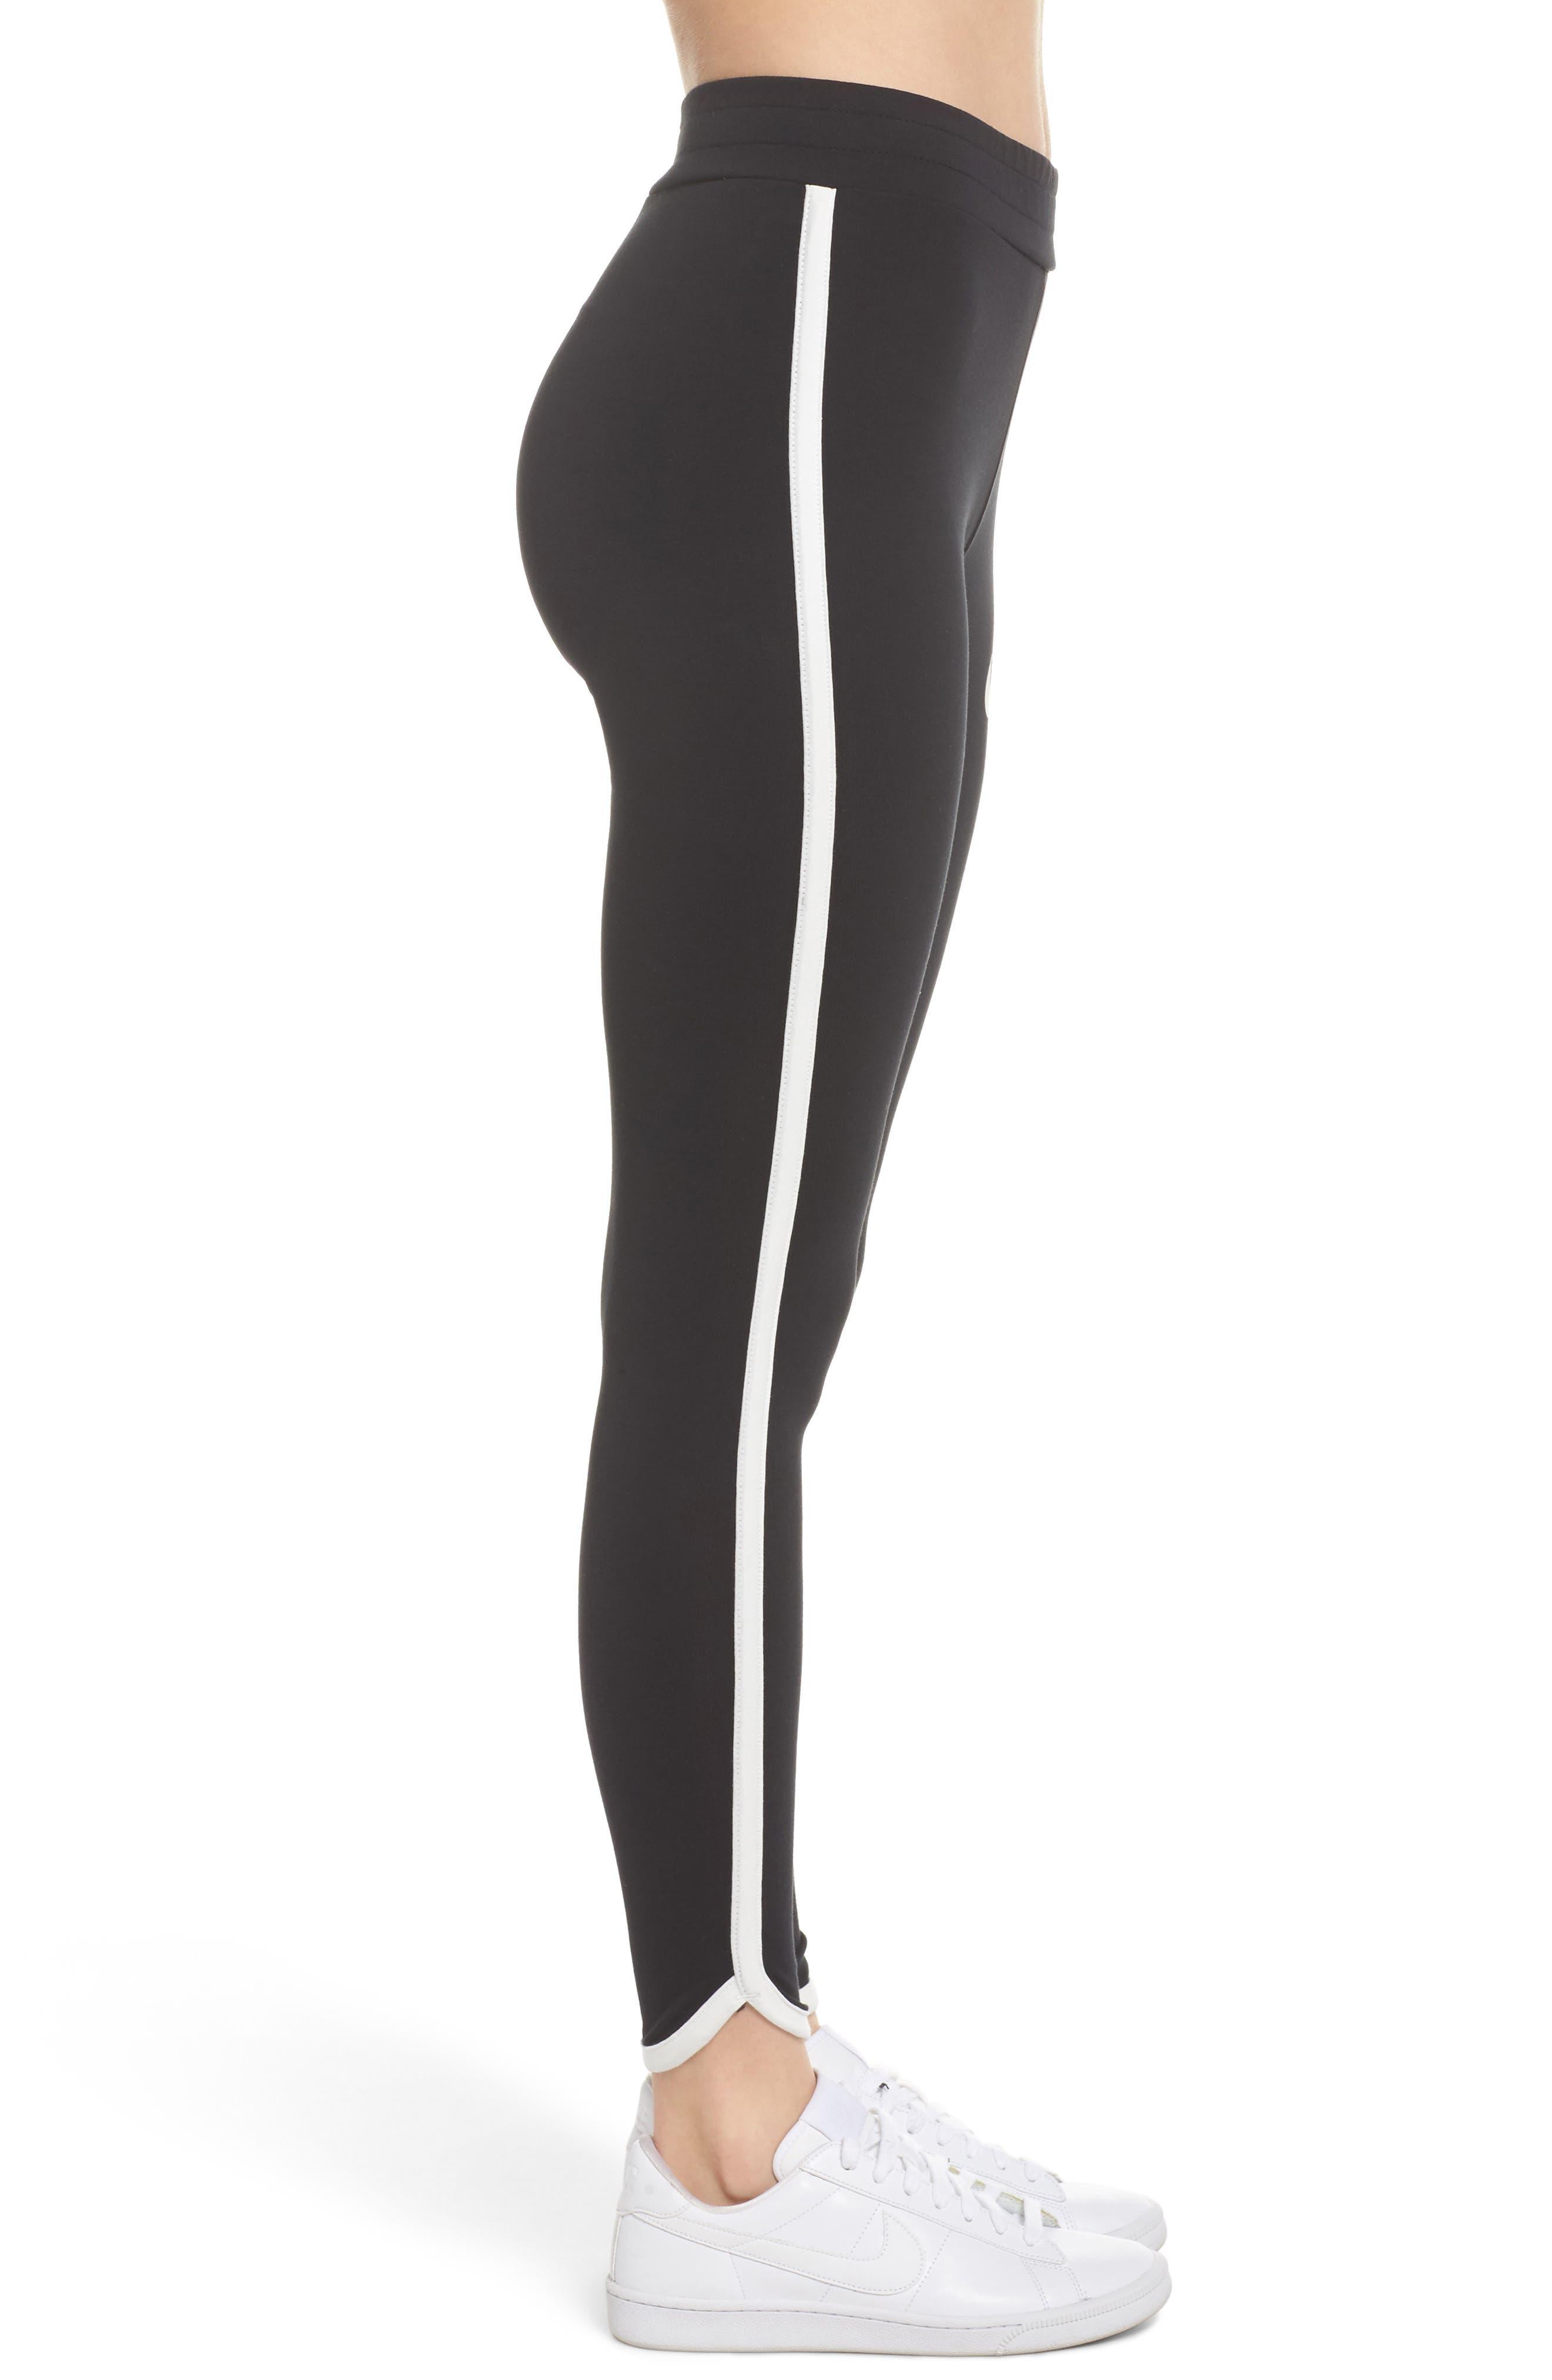 Sportswear Women's Leggings,                             Alternate thumbnail 3, color,                             Black/ Sail